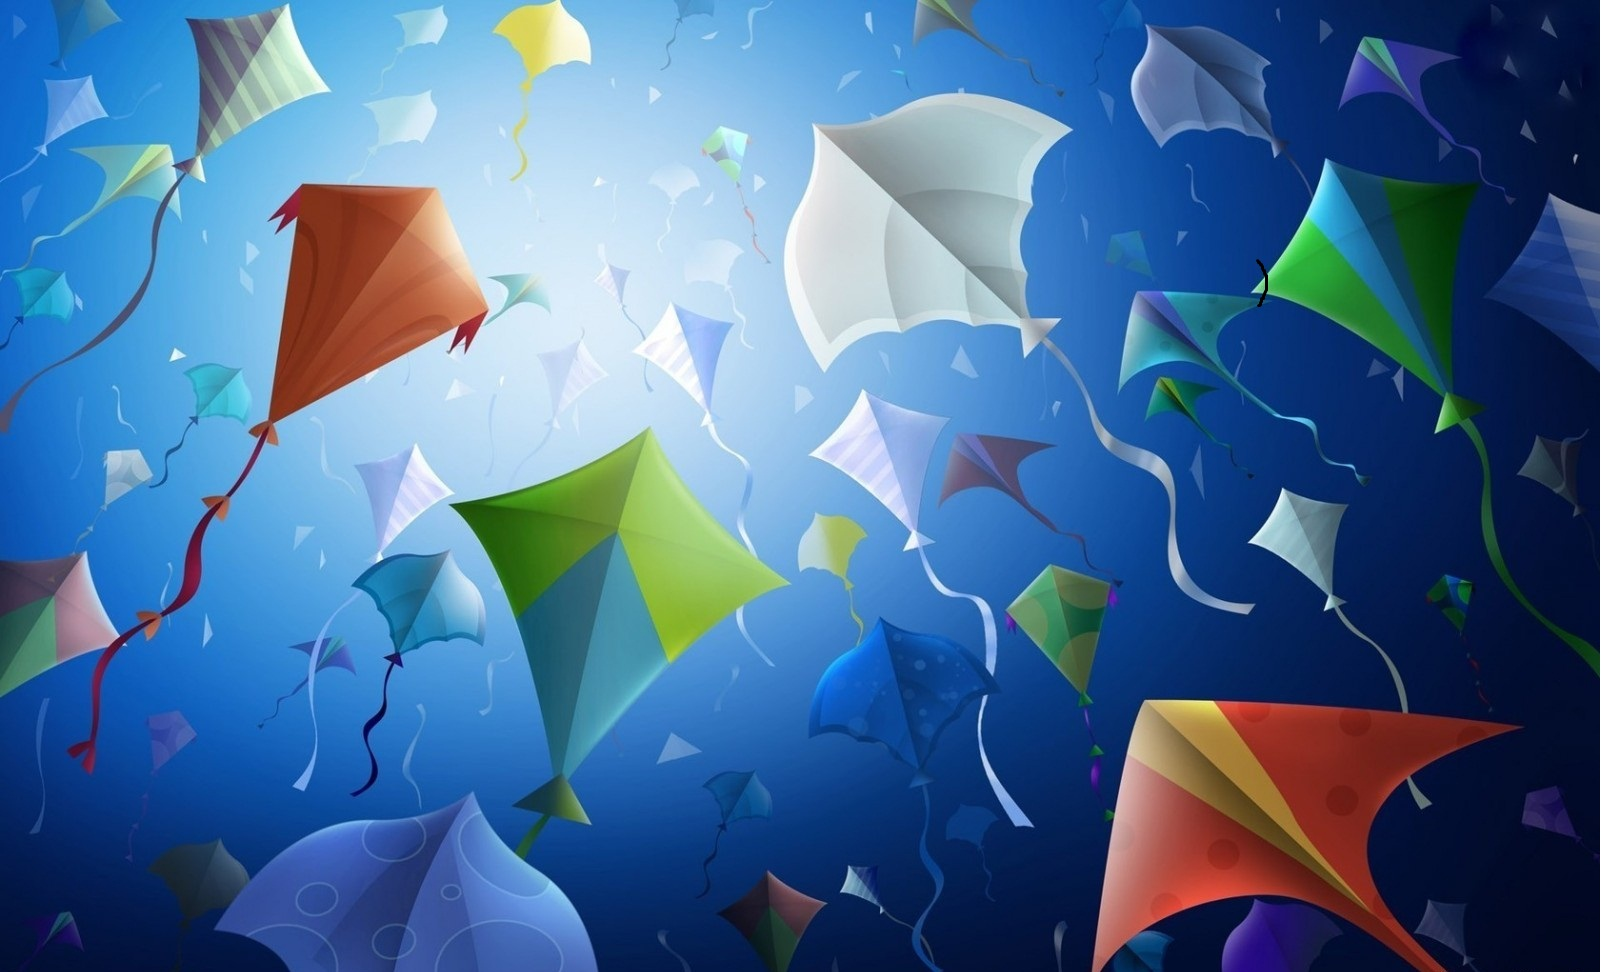 Beautiful Kite Pictures - Beautiful Kite Pictures